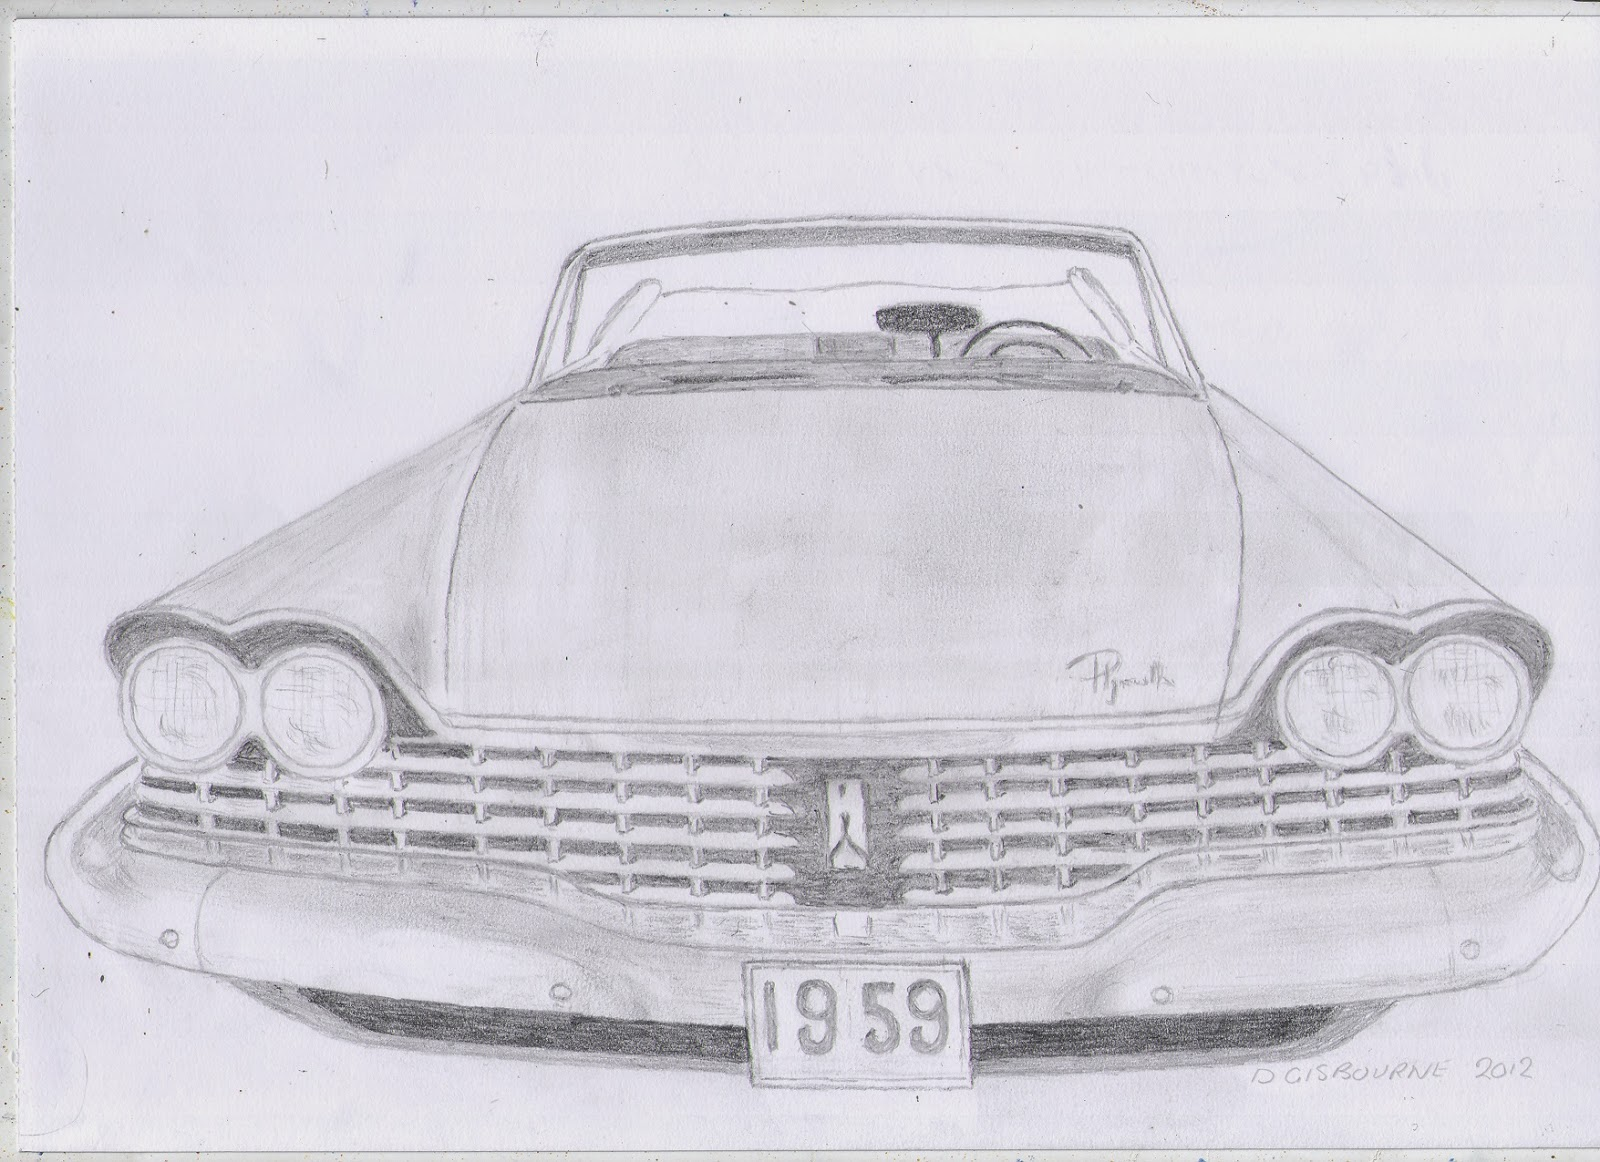 Classic Car Drawings: 1959 Plymouth Fury Original Pencil Drawing